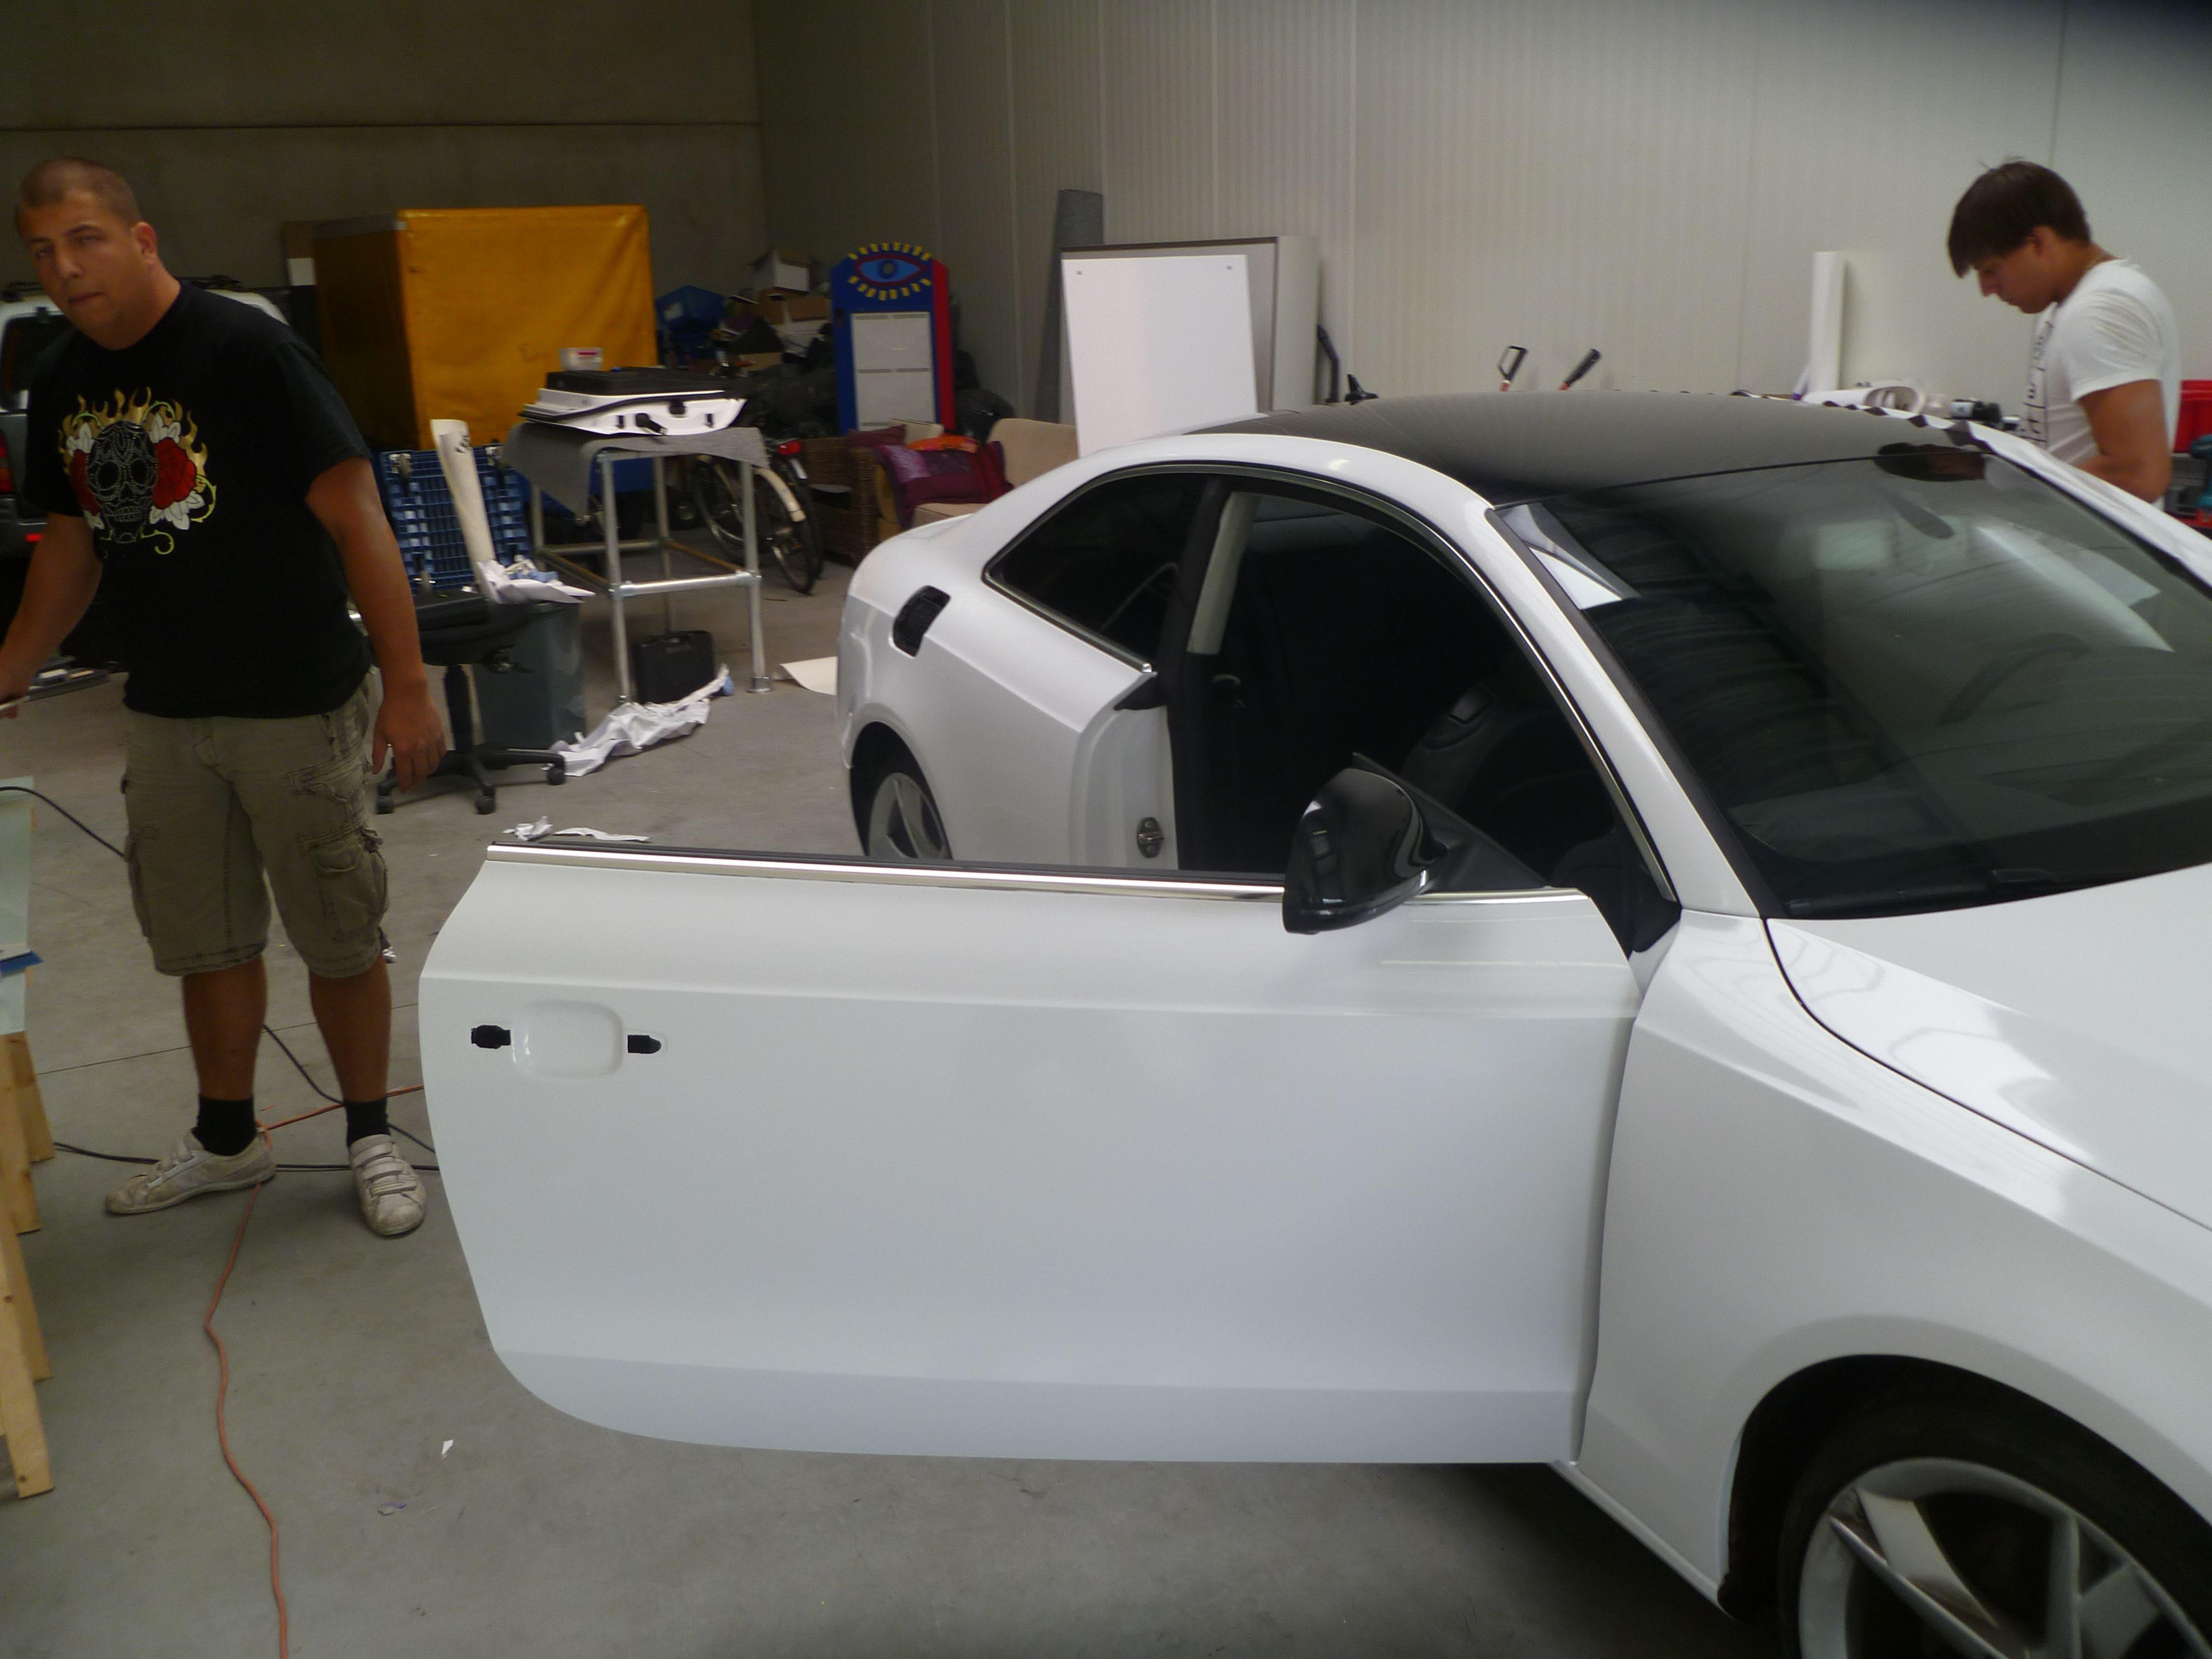 Audi A5 coupe met Metallic Witte Wrap, Carwrapping door Wrapmyride.nu Foto-nr:4730, ©2021